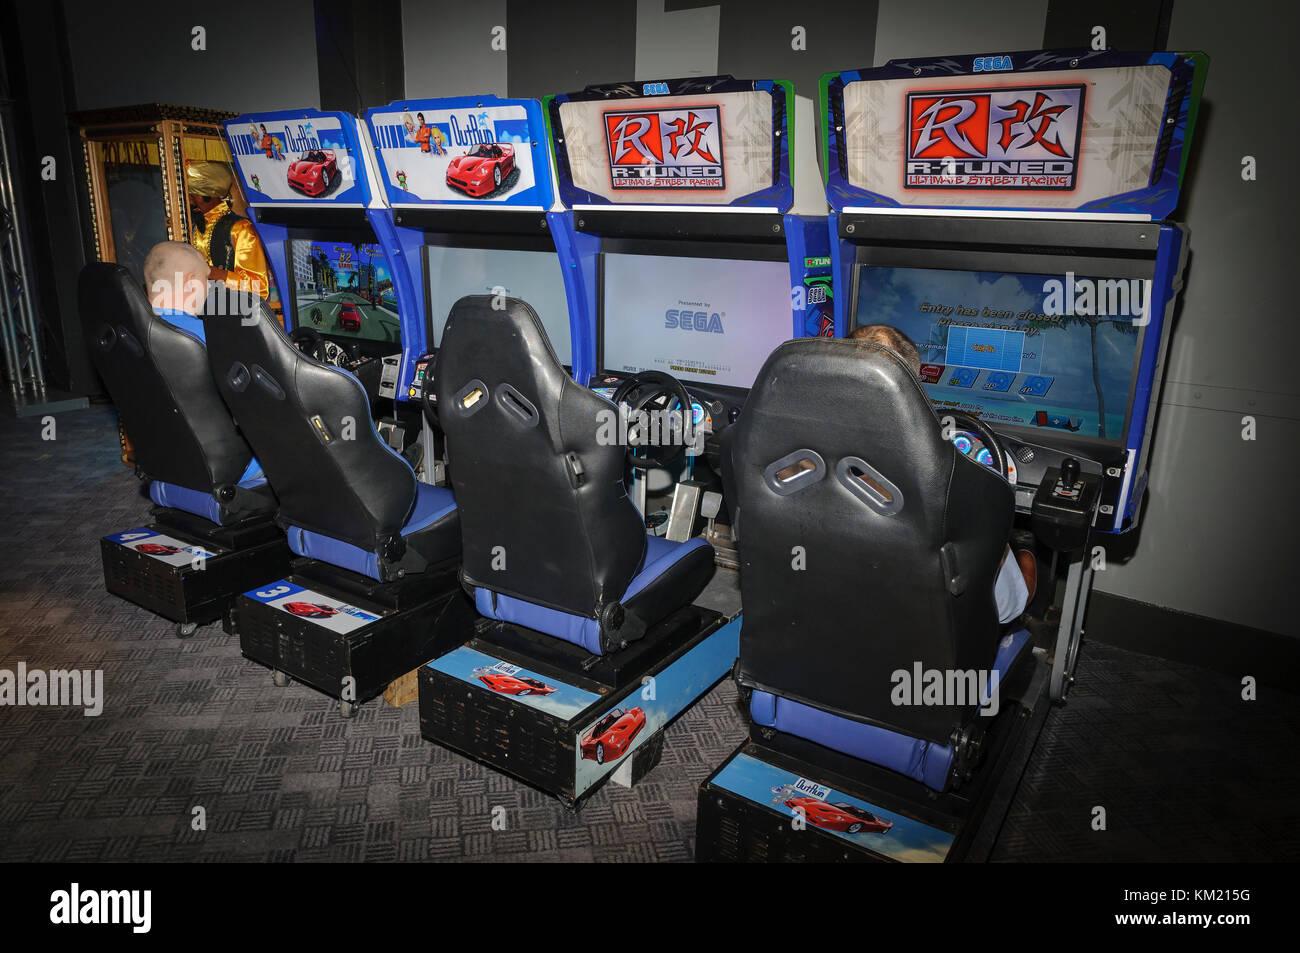 Arcade driving game machines - Stock Image